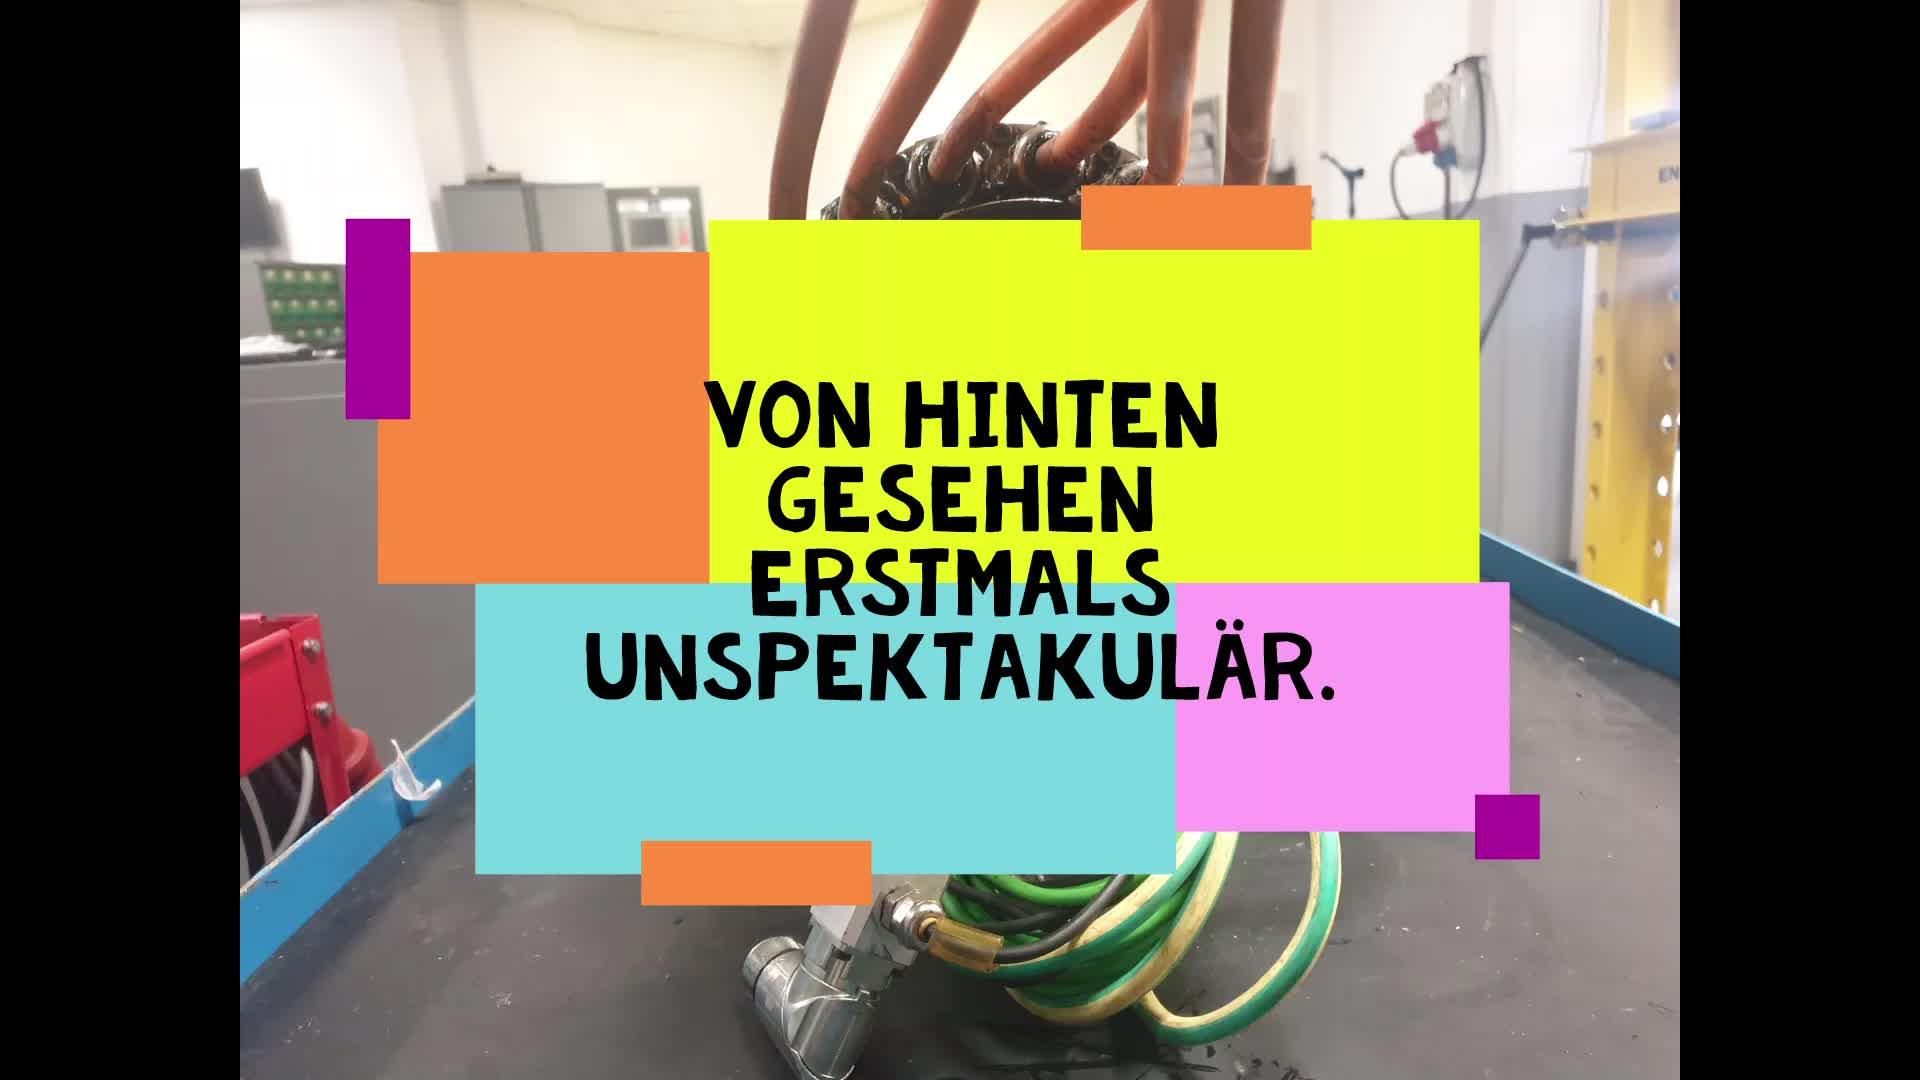 Franz Kessler 18000U/min HSK63 +IKZ